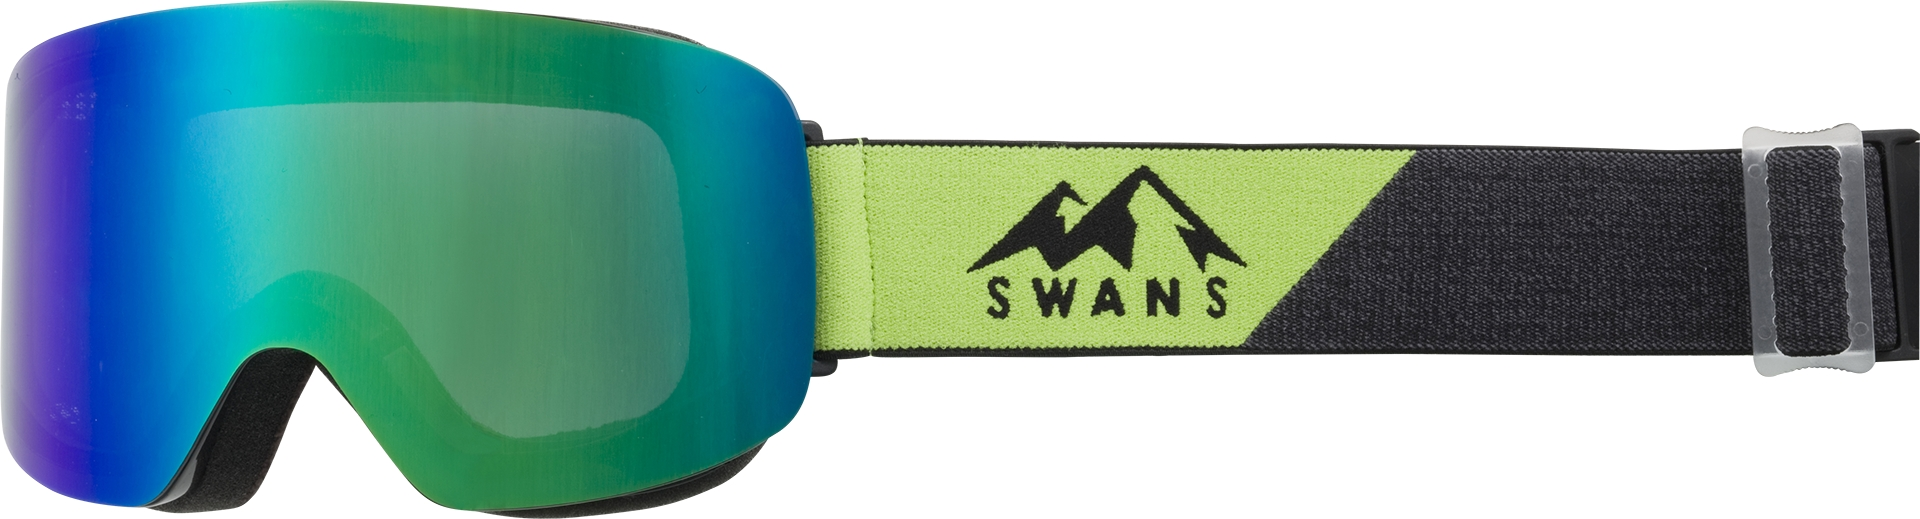 Swans 120 MDH BKLM.jpg